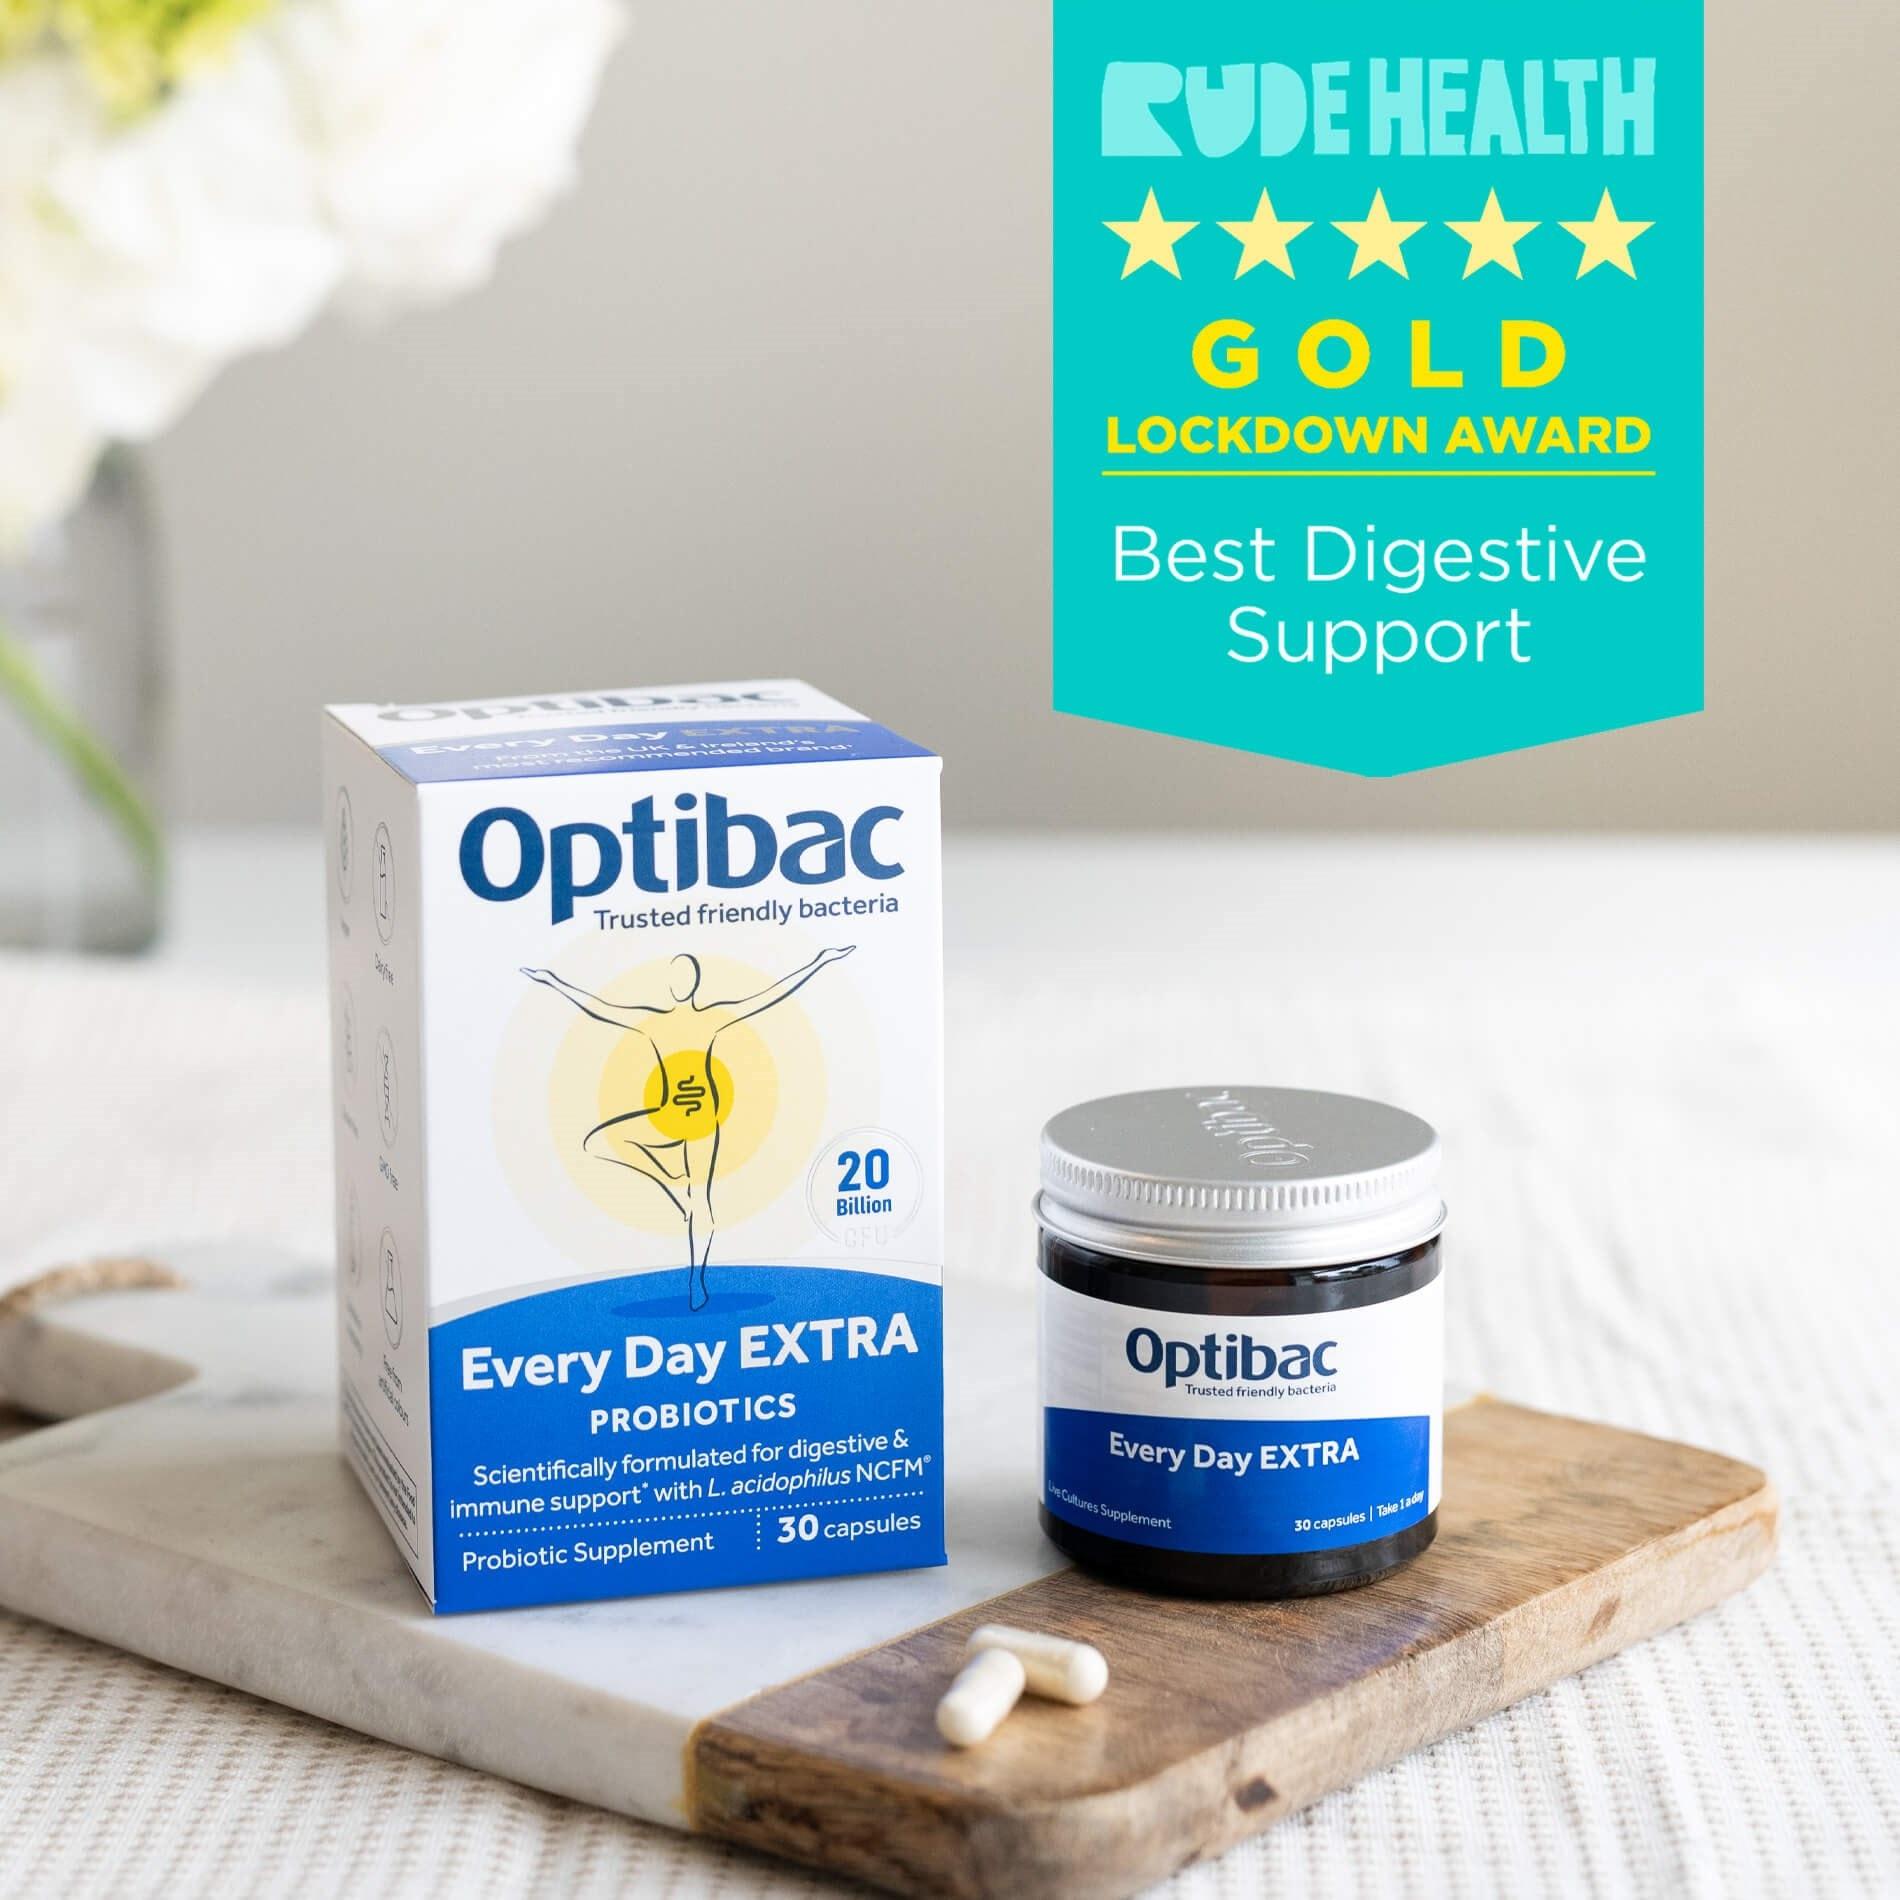 Optibac Probiotics Awards